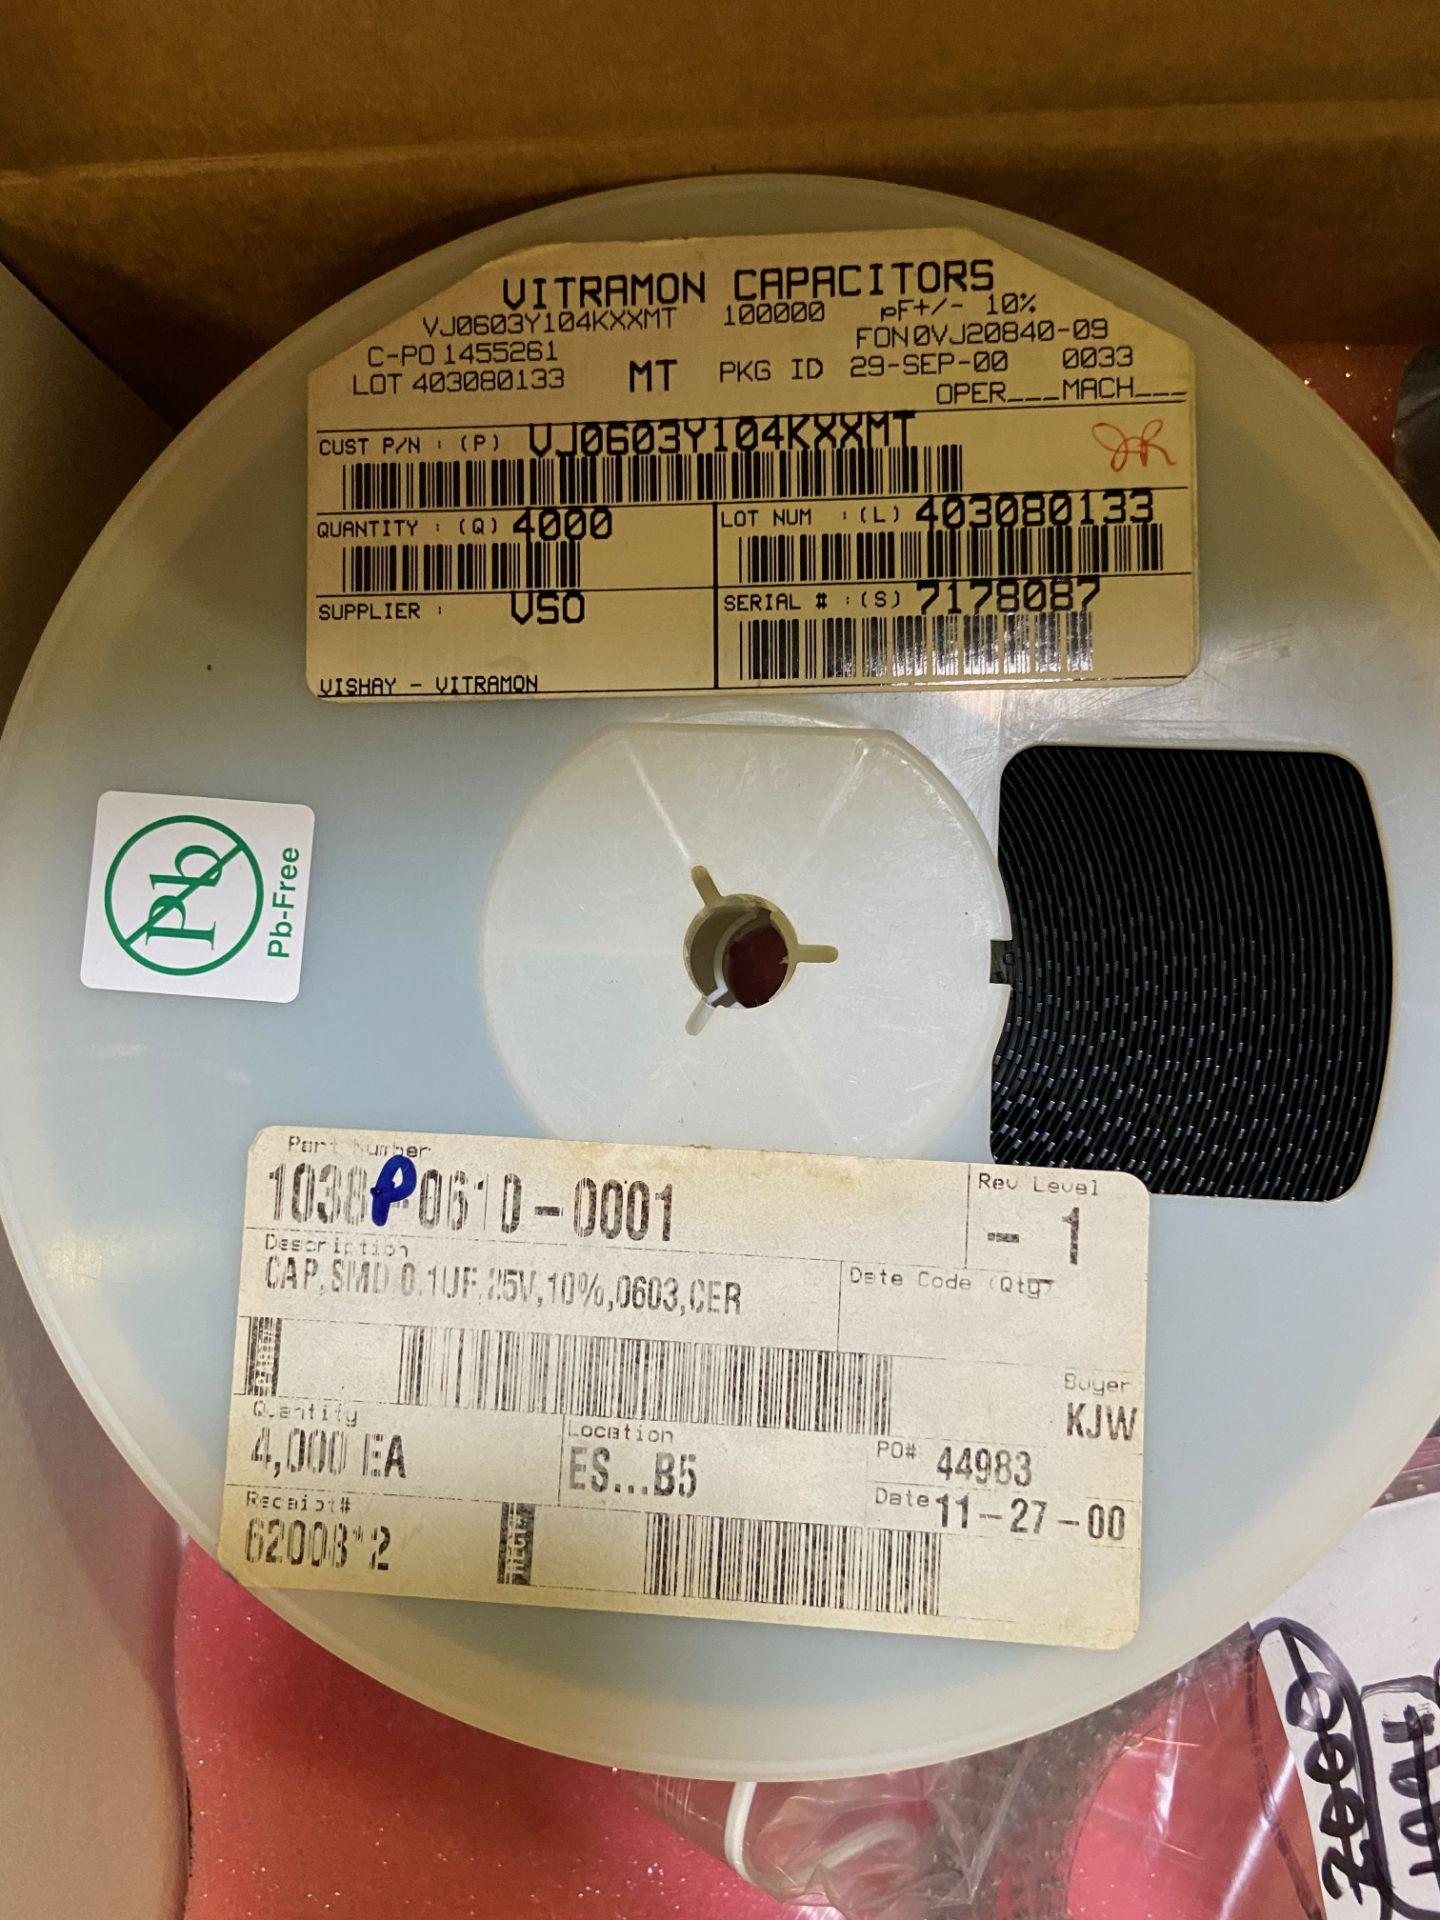 Vishay VJ0603Y104KXXMT, Cap Ceramic 0.1uF 25V X7R 10% Pad SMD 0603 150°C Automotive T/R, APROX QTY - Image 3 of 15